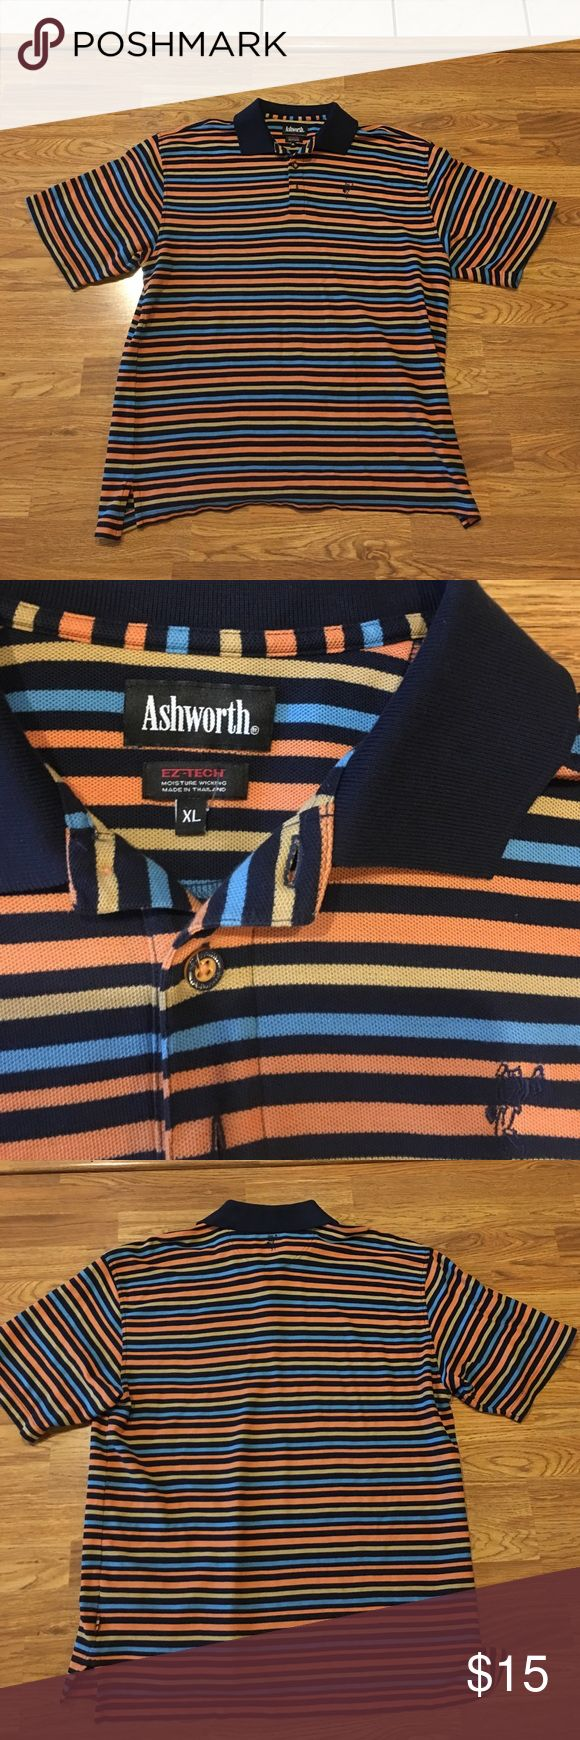 Ashworth golf shirt Worn once Ashworth Shirts Polos